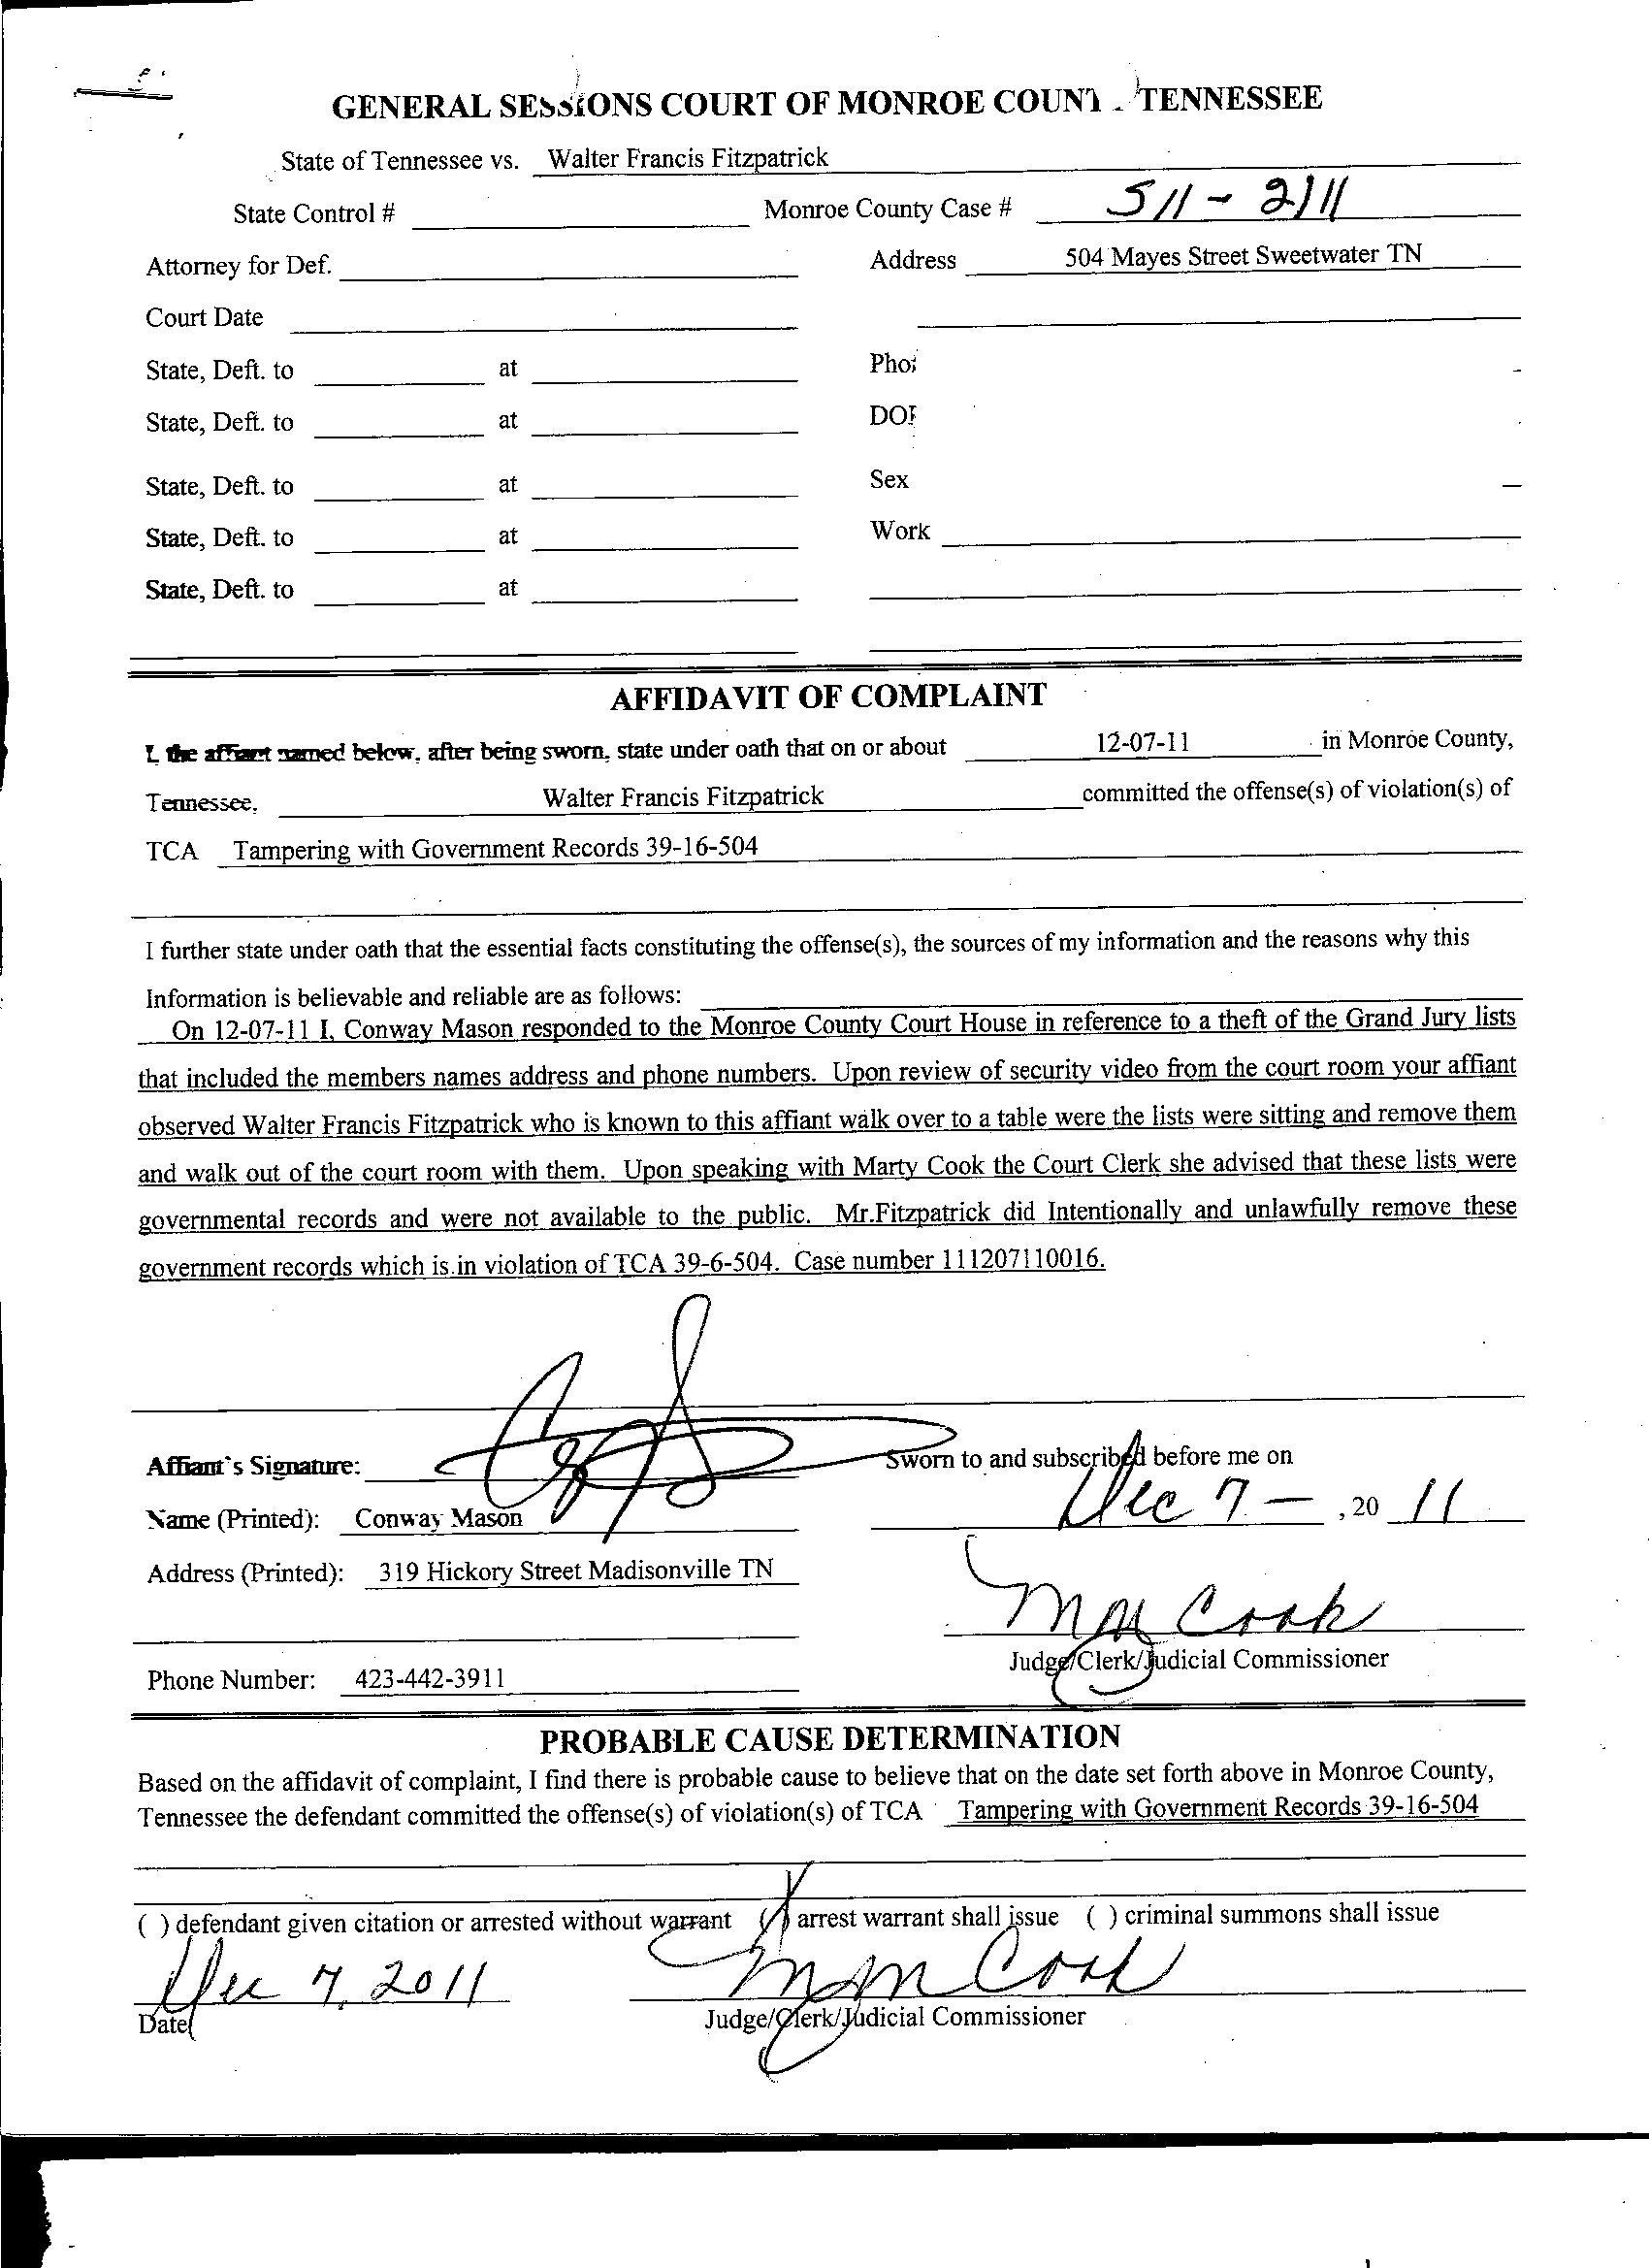 WFF Affidavit of Complaint 001